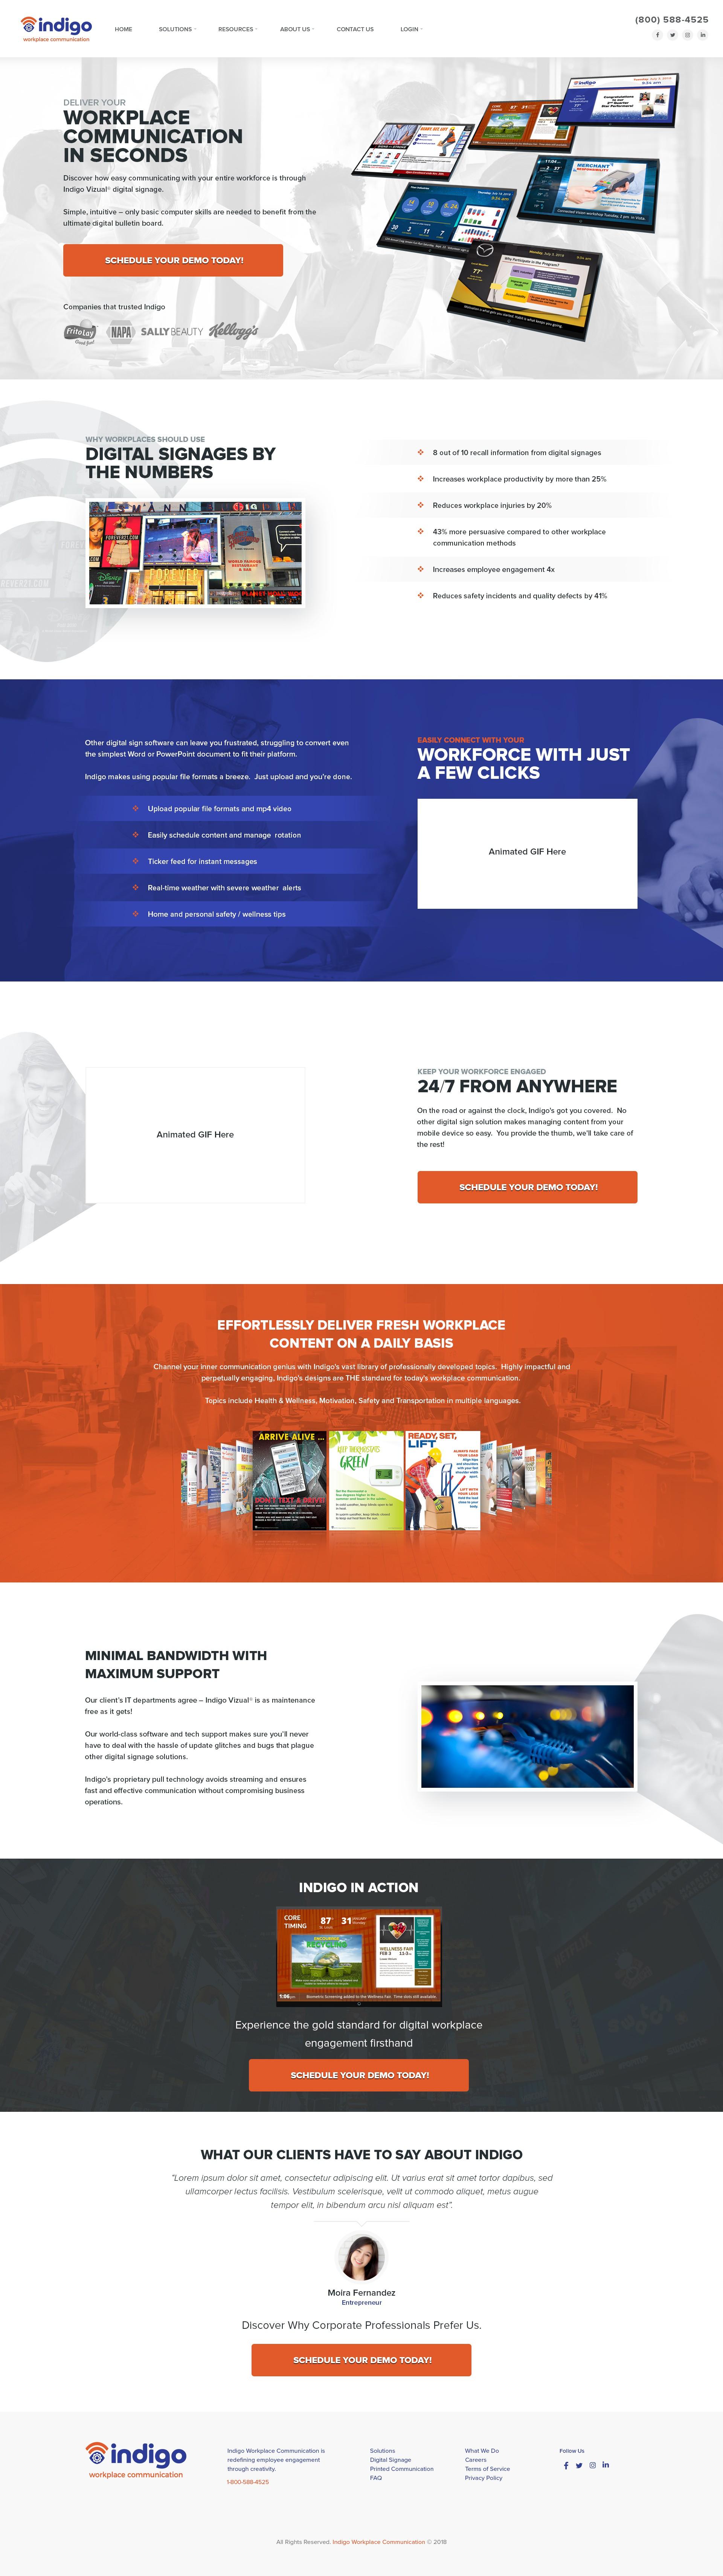 Indigo Home Page